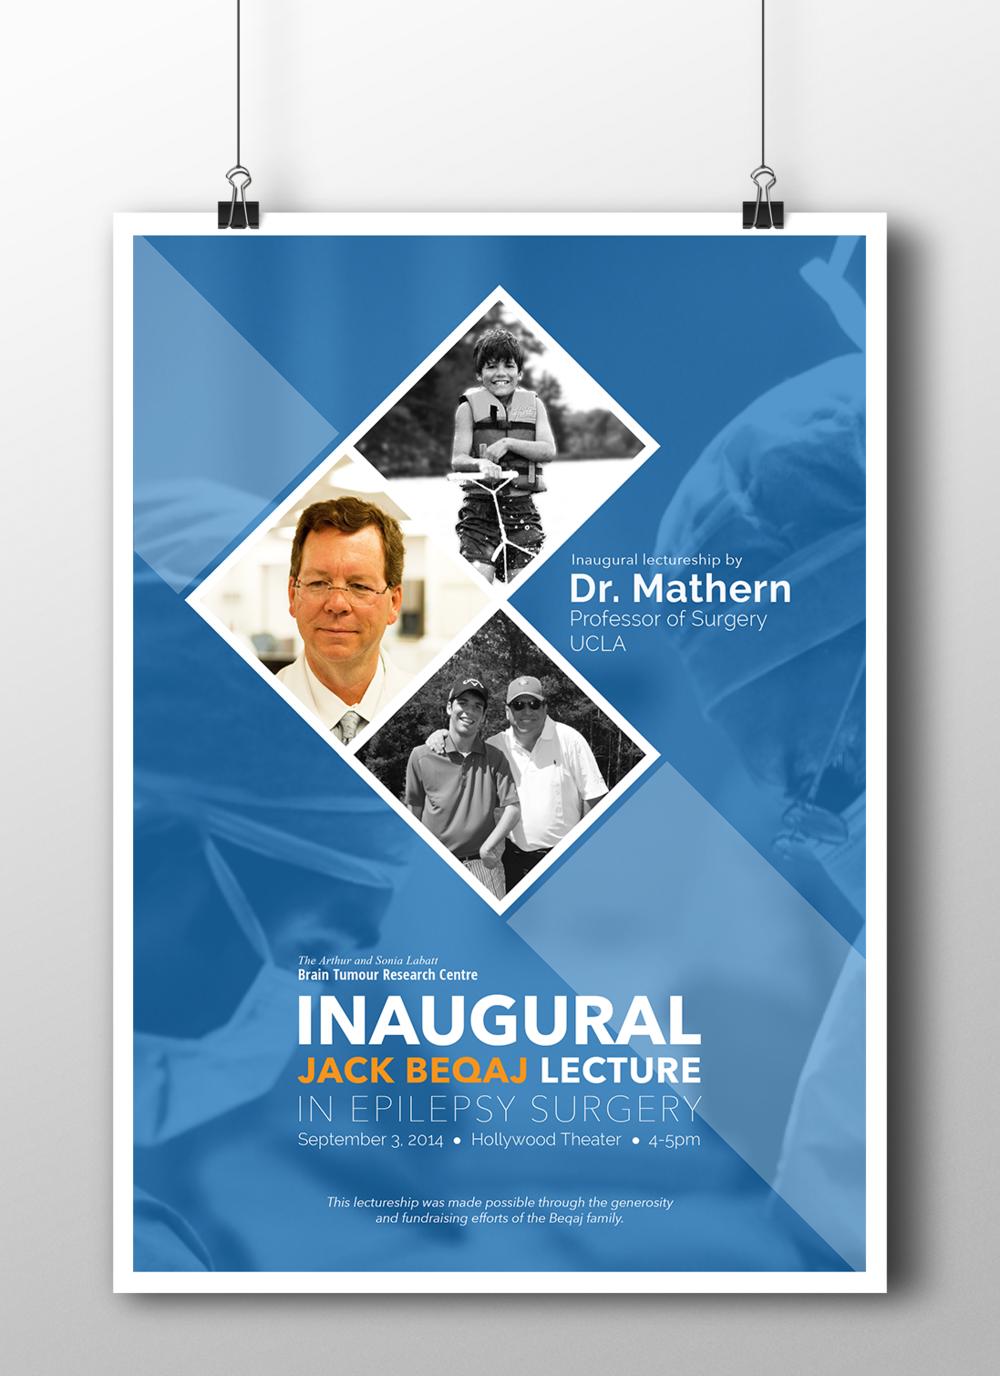 WEB_jack_beqaj_poster_2014_version2.jpg